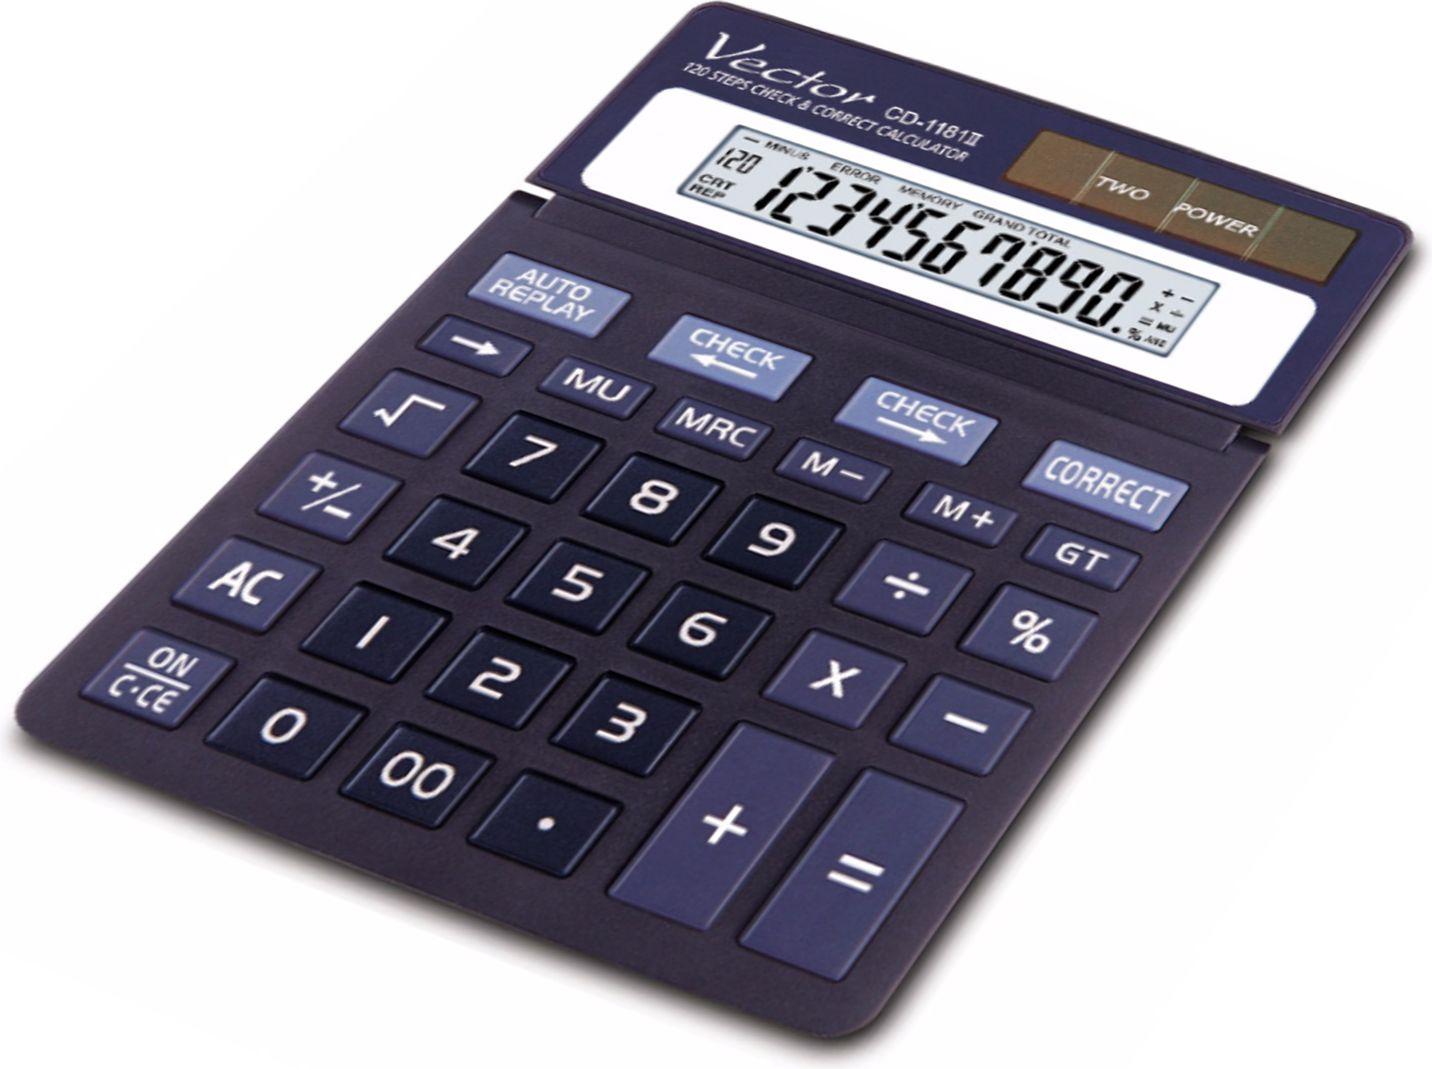 VECTOR KAV CD-1181II kalkulators